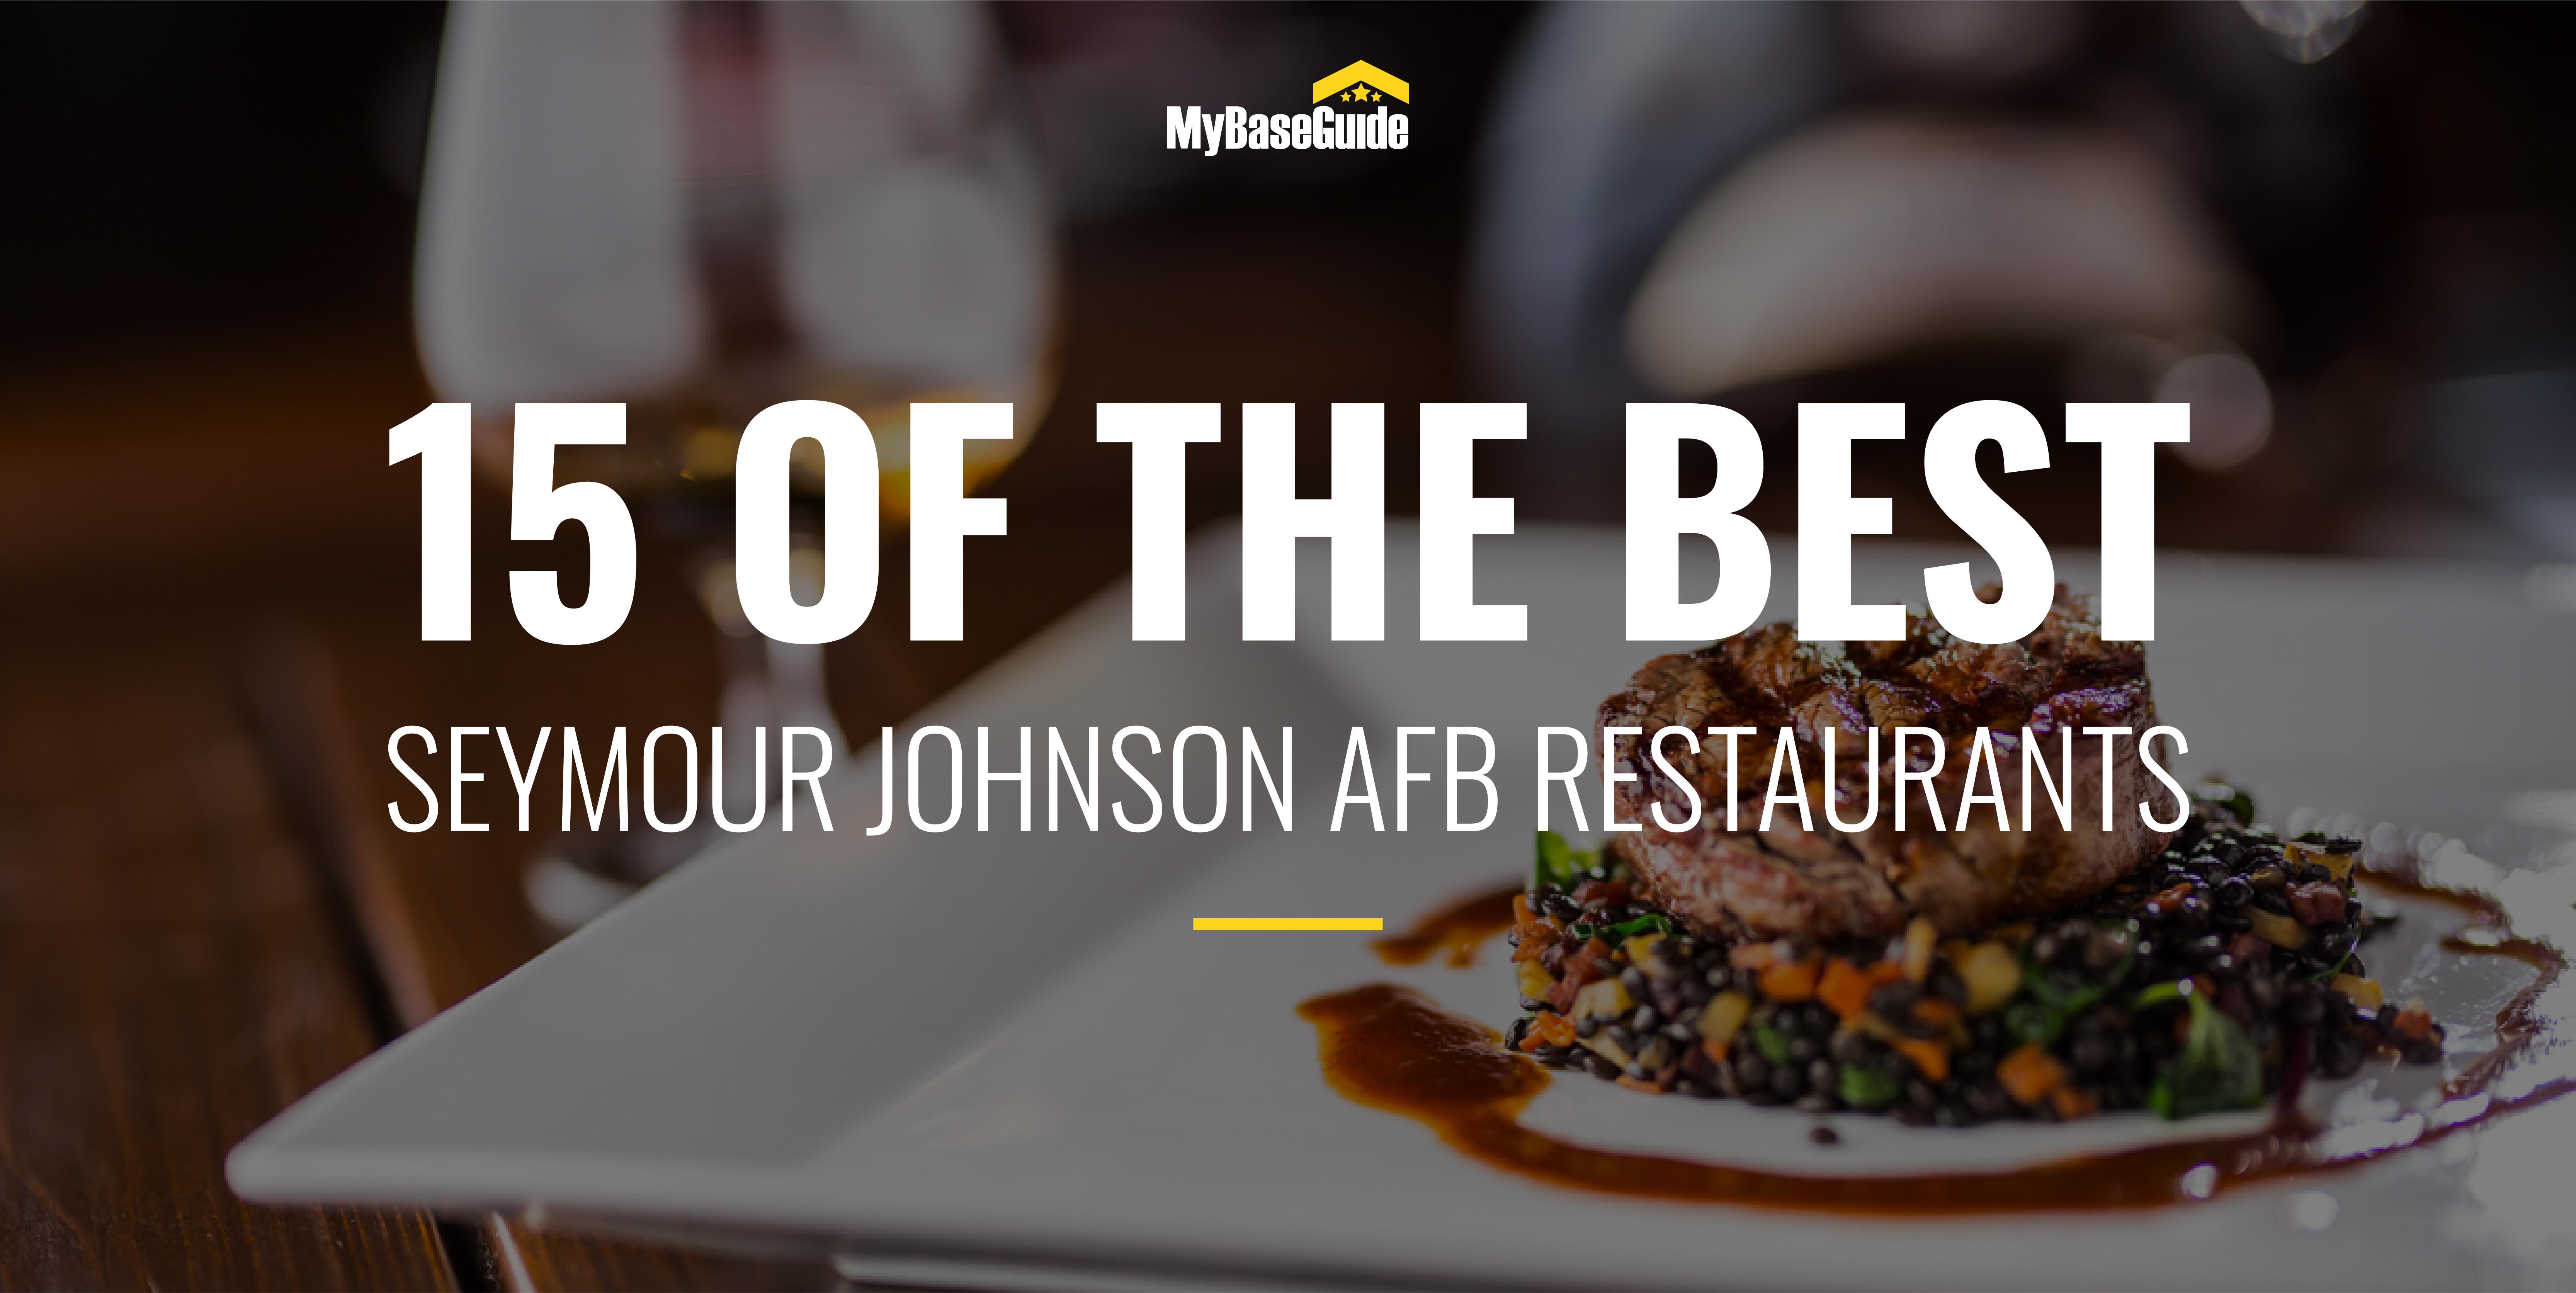 15 of the Best Restaurants Near Seymour Johnson AFB